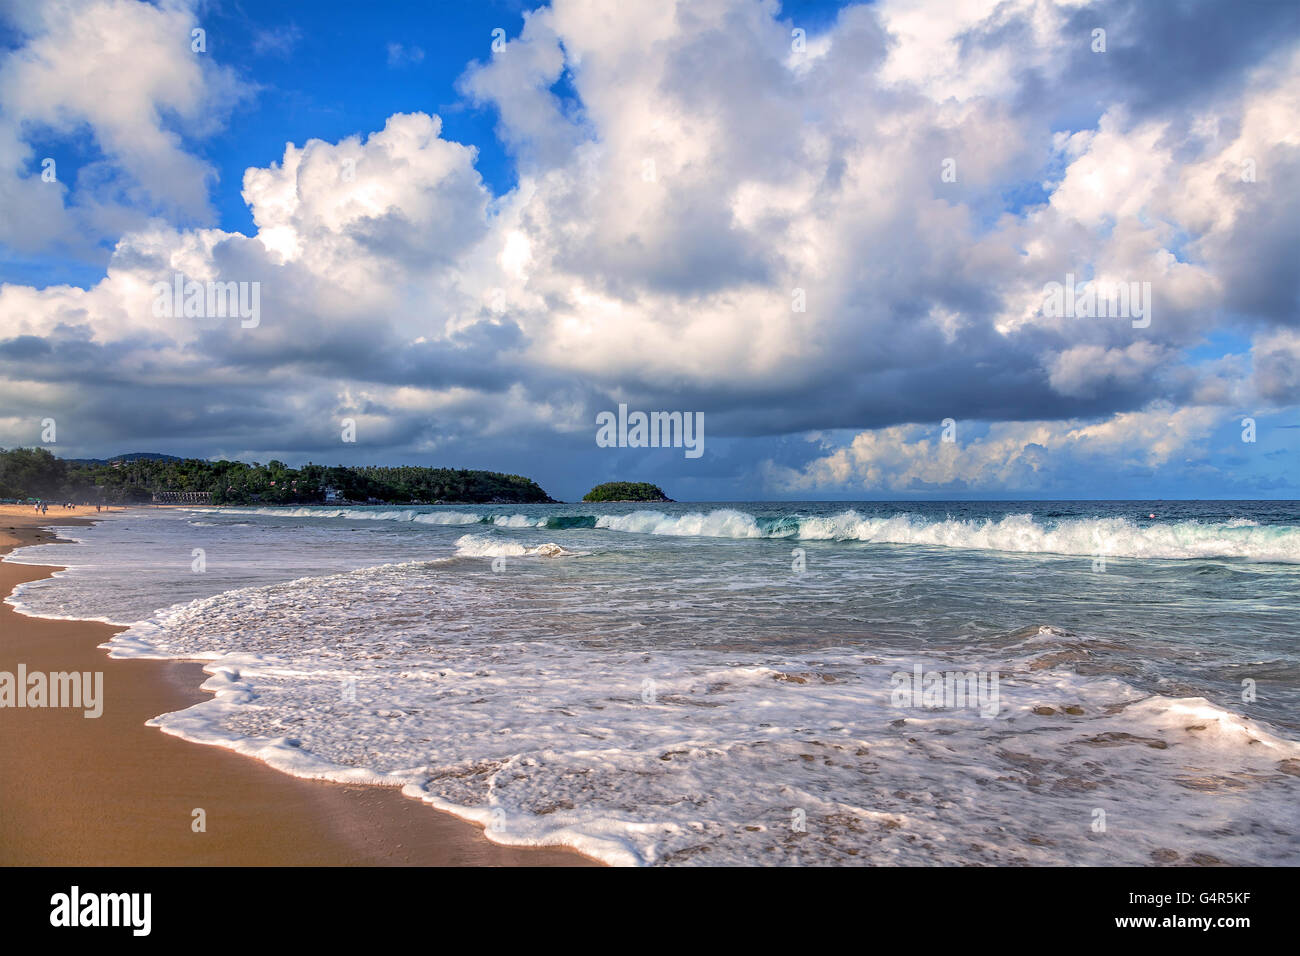 Storm on Karon Beach. Phuket Island in Thailand. - Stock Image